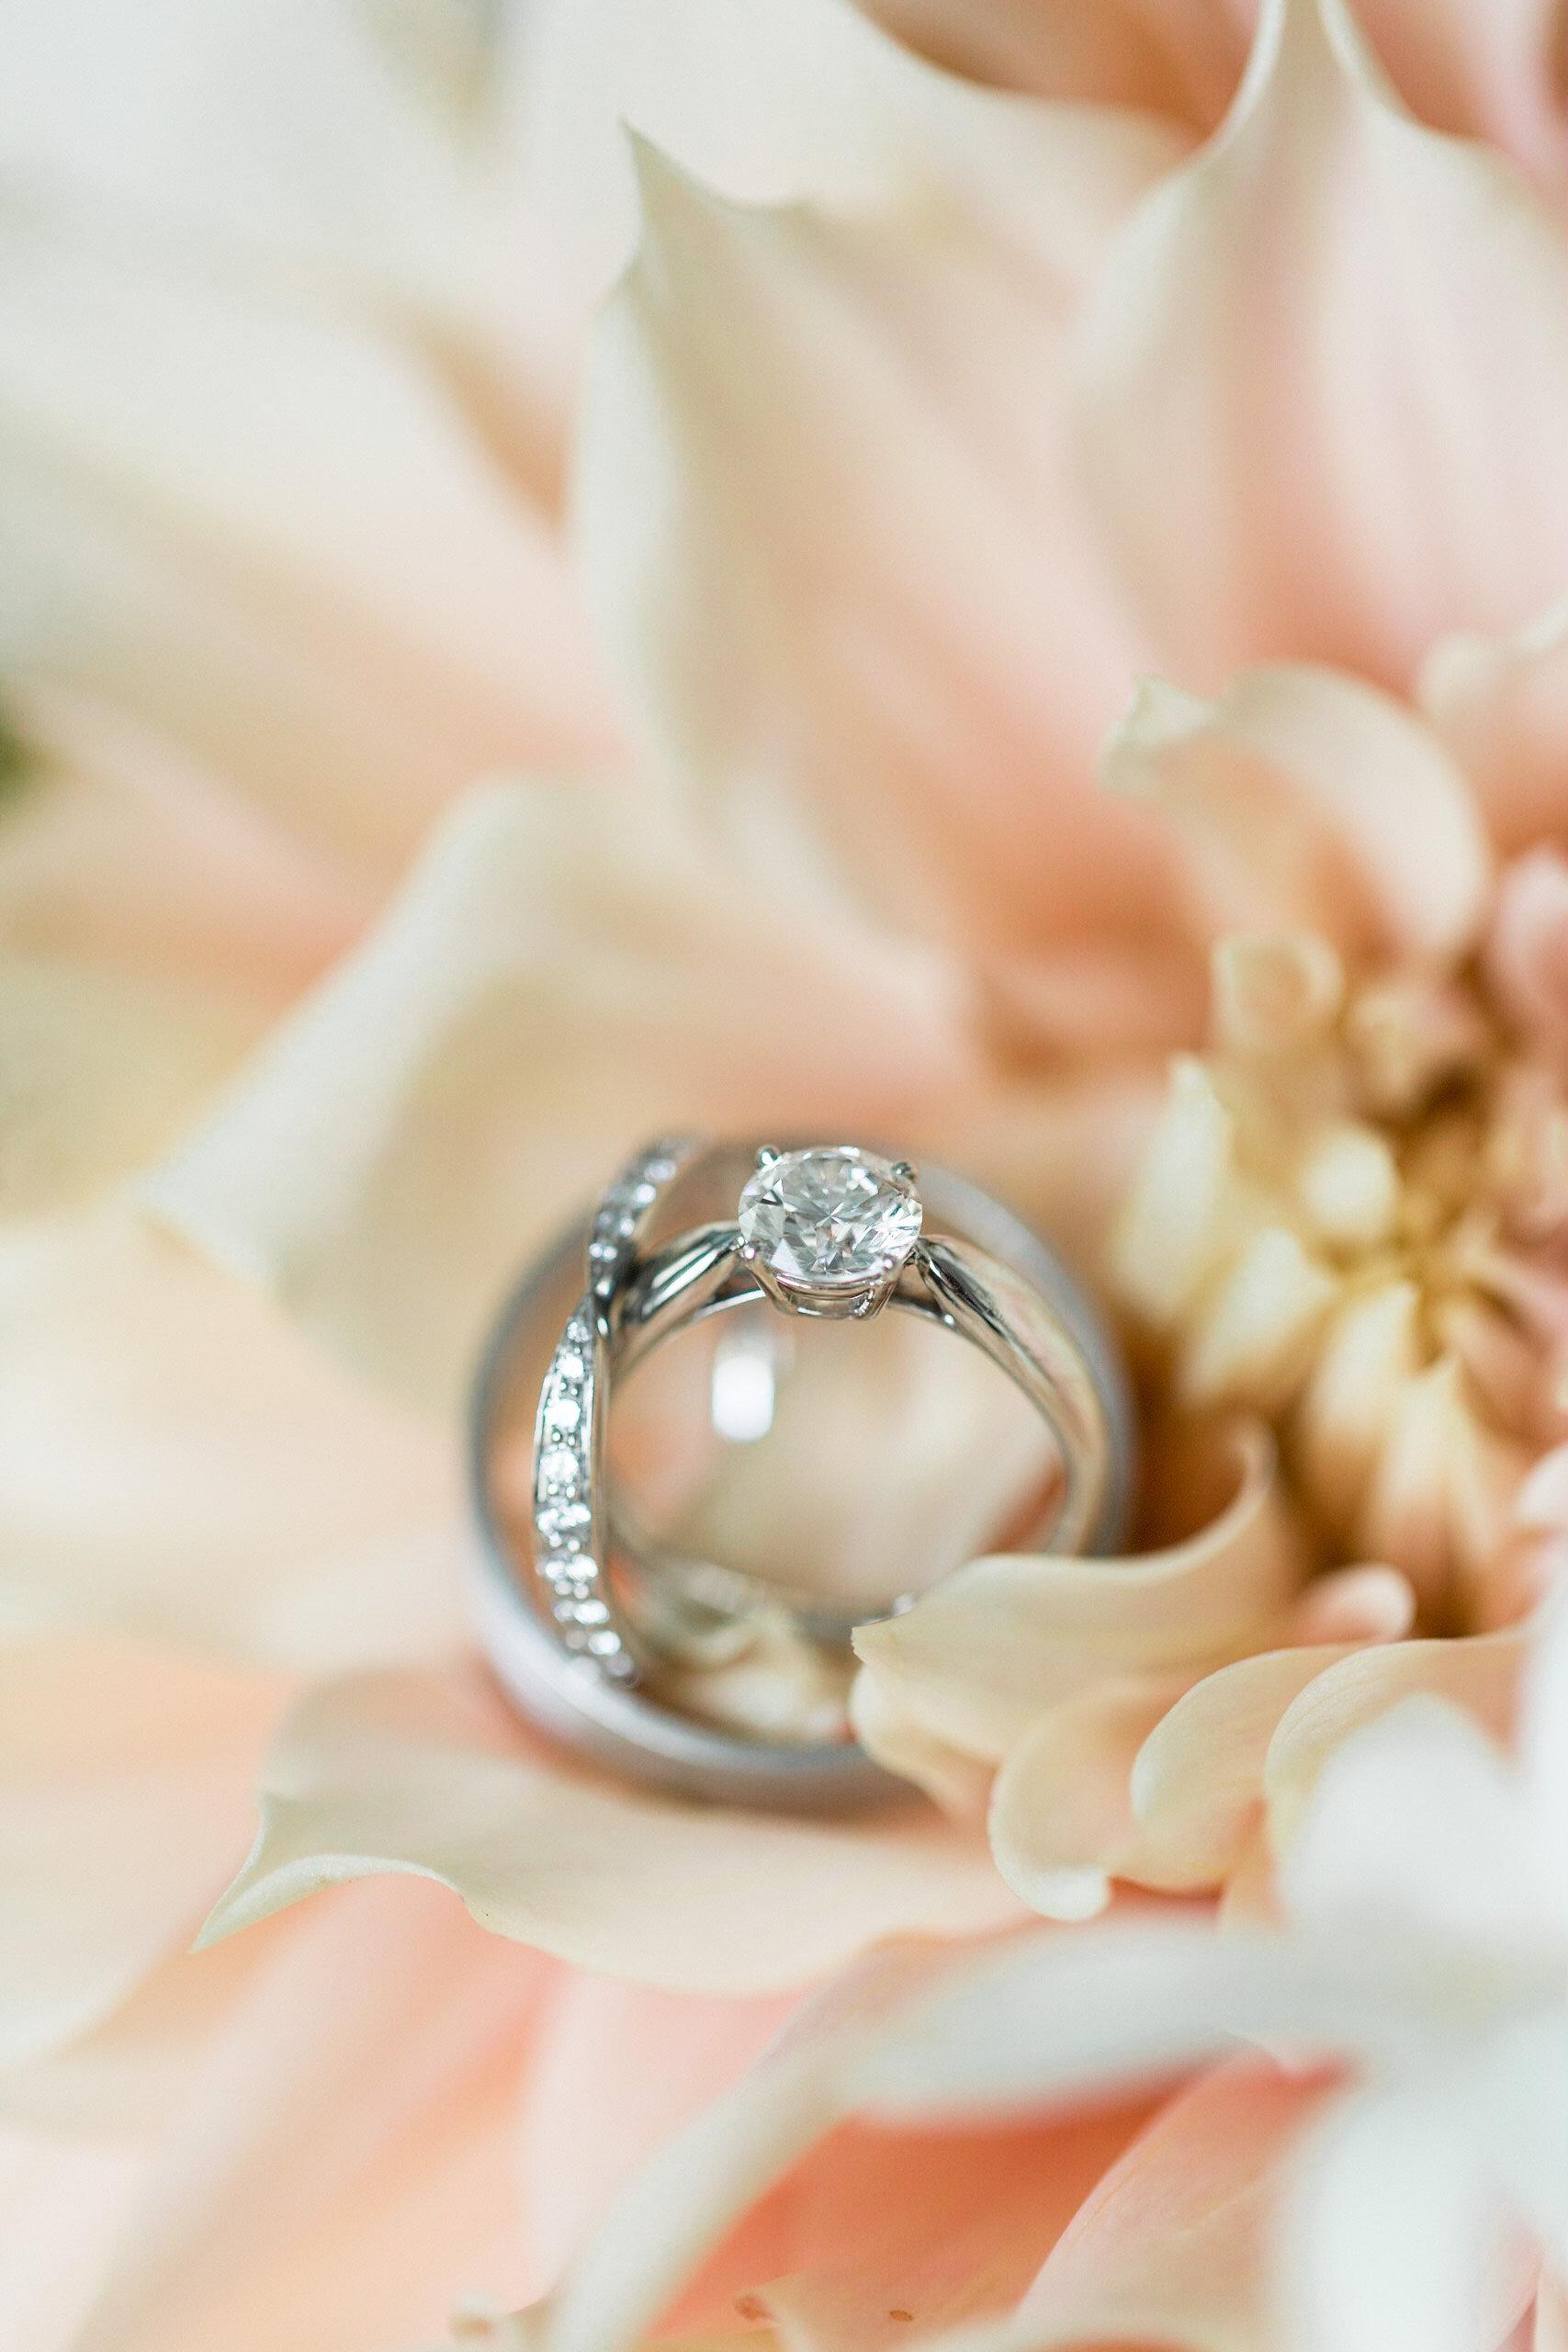 Wedding Ring detail shot at Tranquility Farm